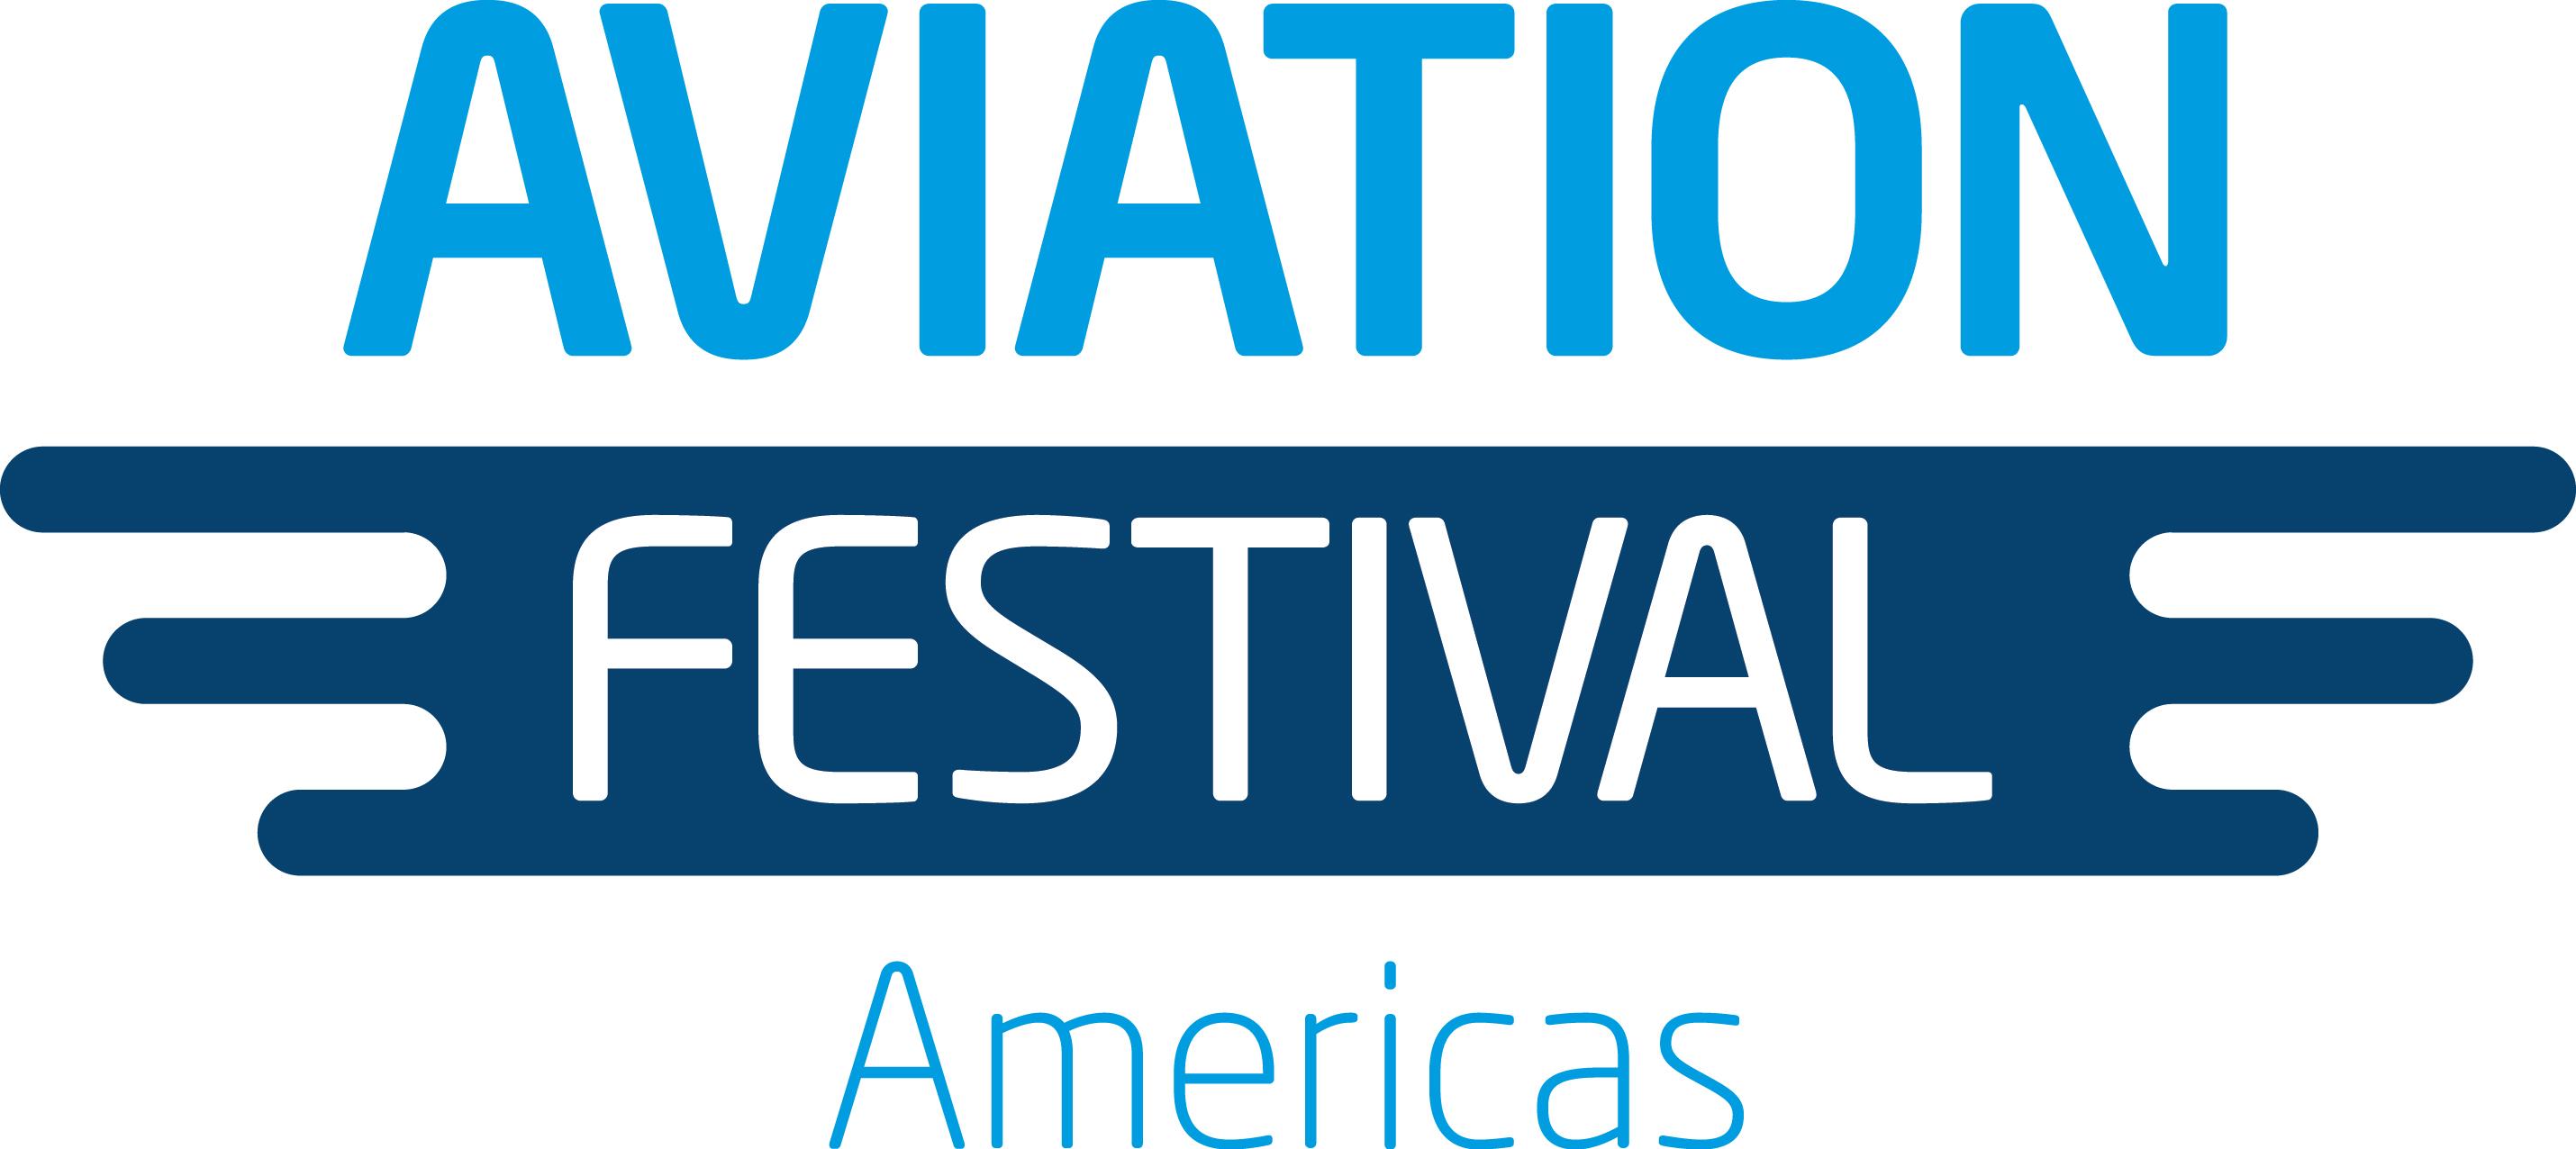 Aviation Festival Americas 2016